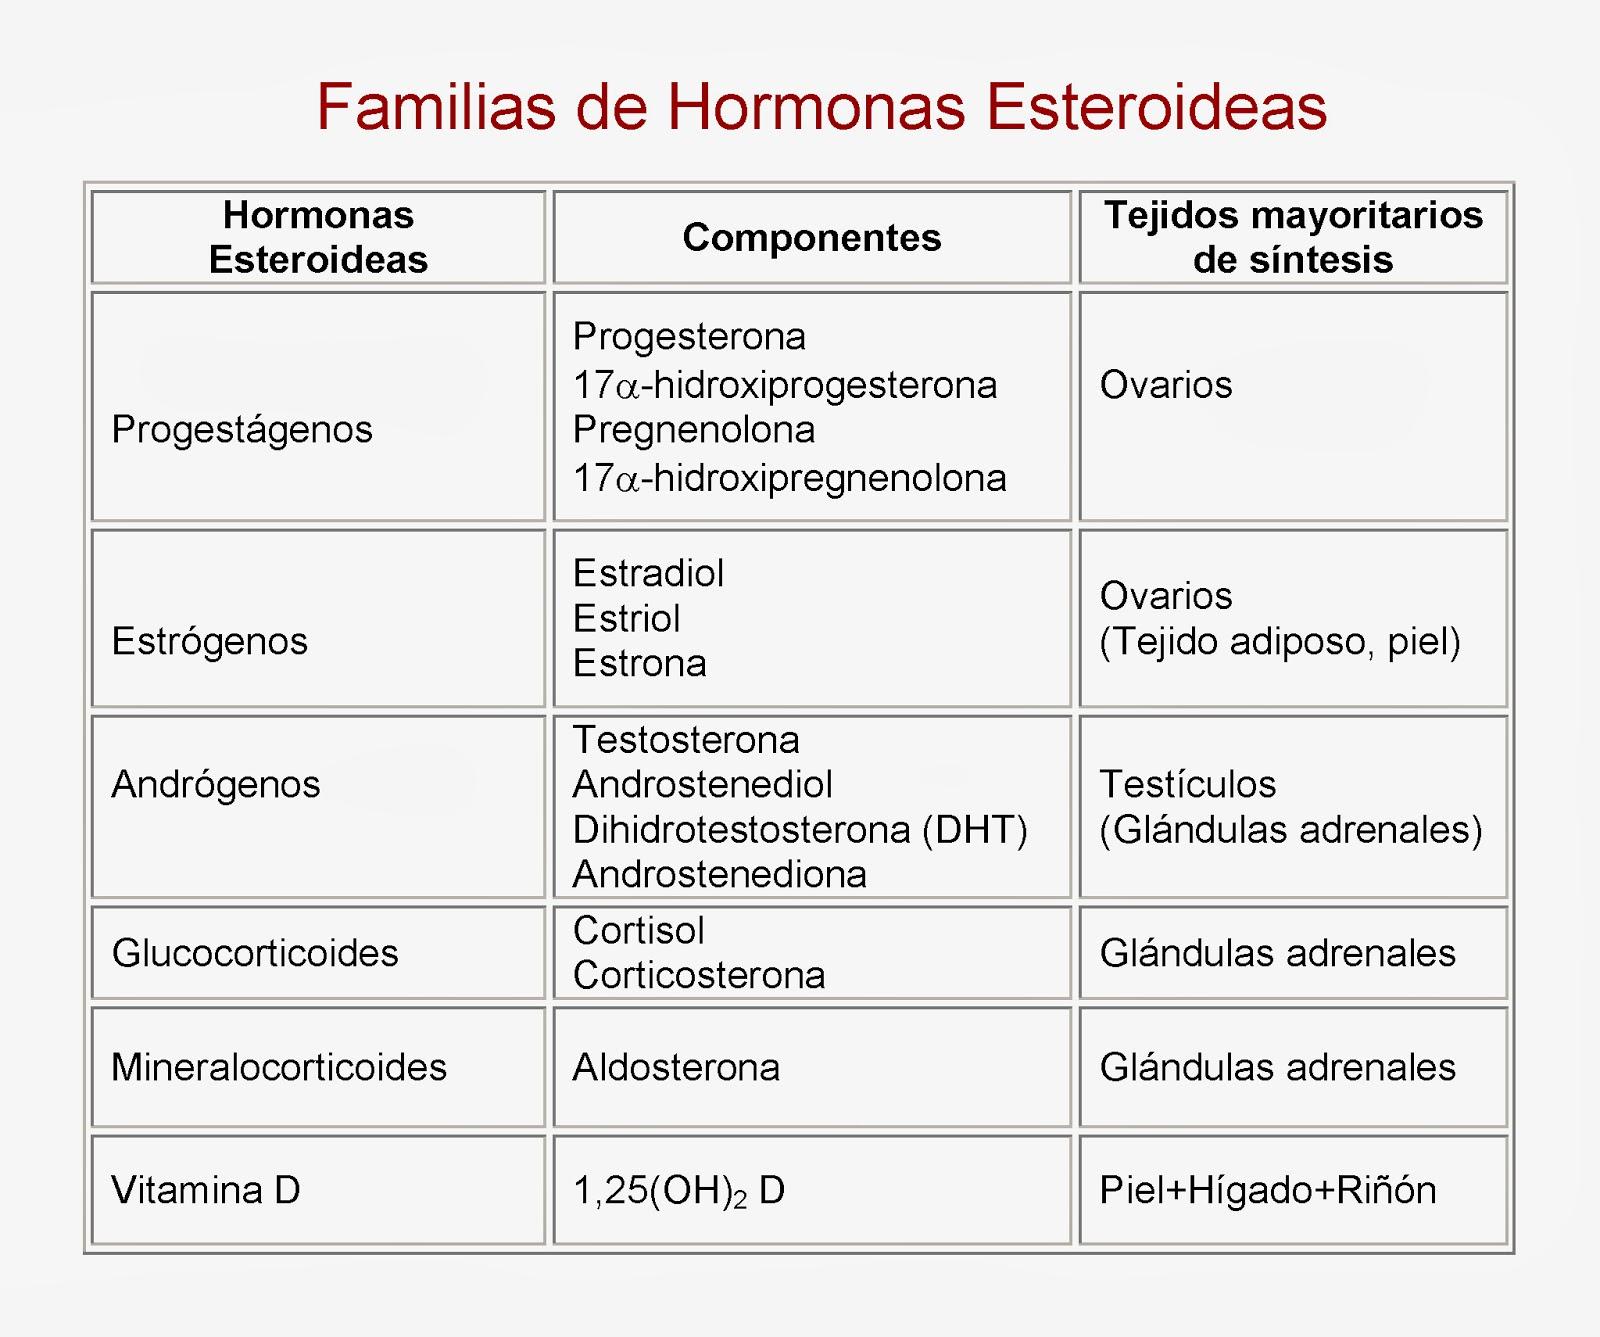 Familias de hormoans esteroideas